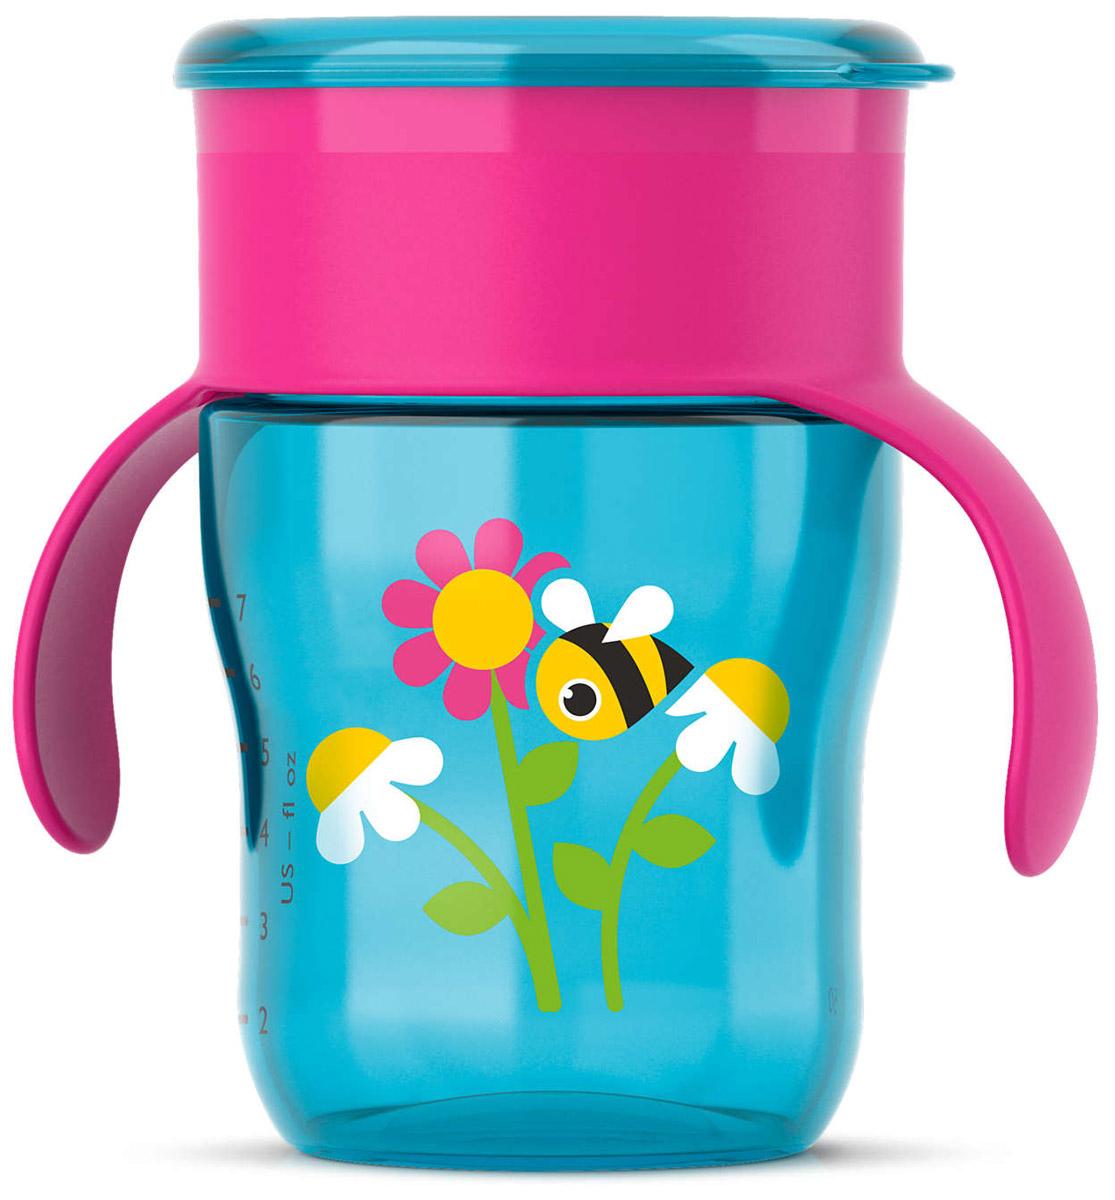 Philips Avent Чашка-поильник от 12 месяцев цвет голубой фуксия 260 мл пчелка SCF782/20 -  Поильники